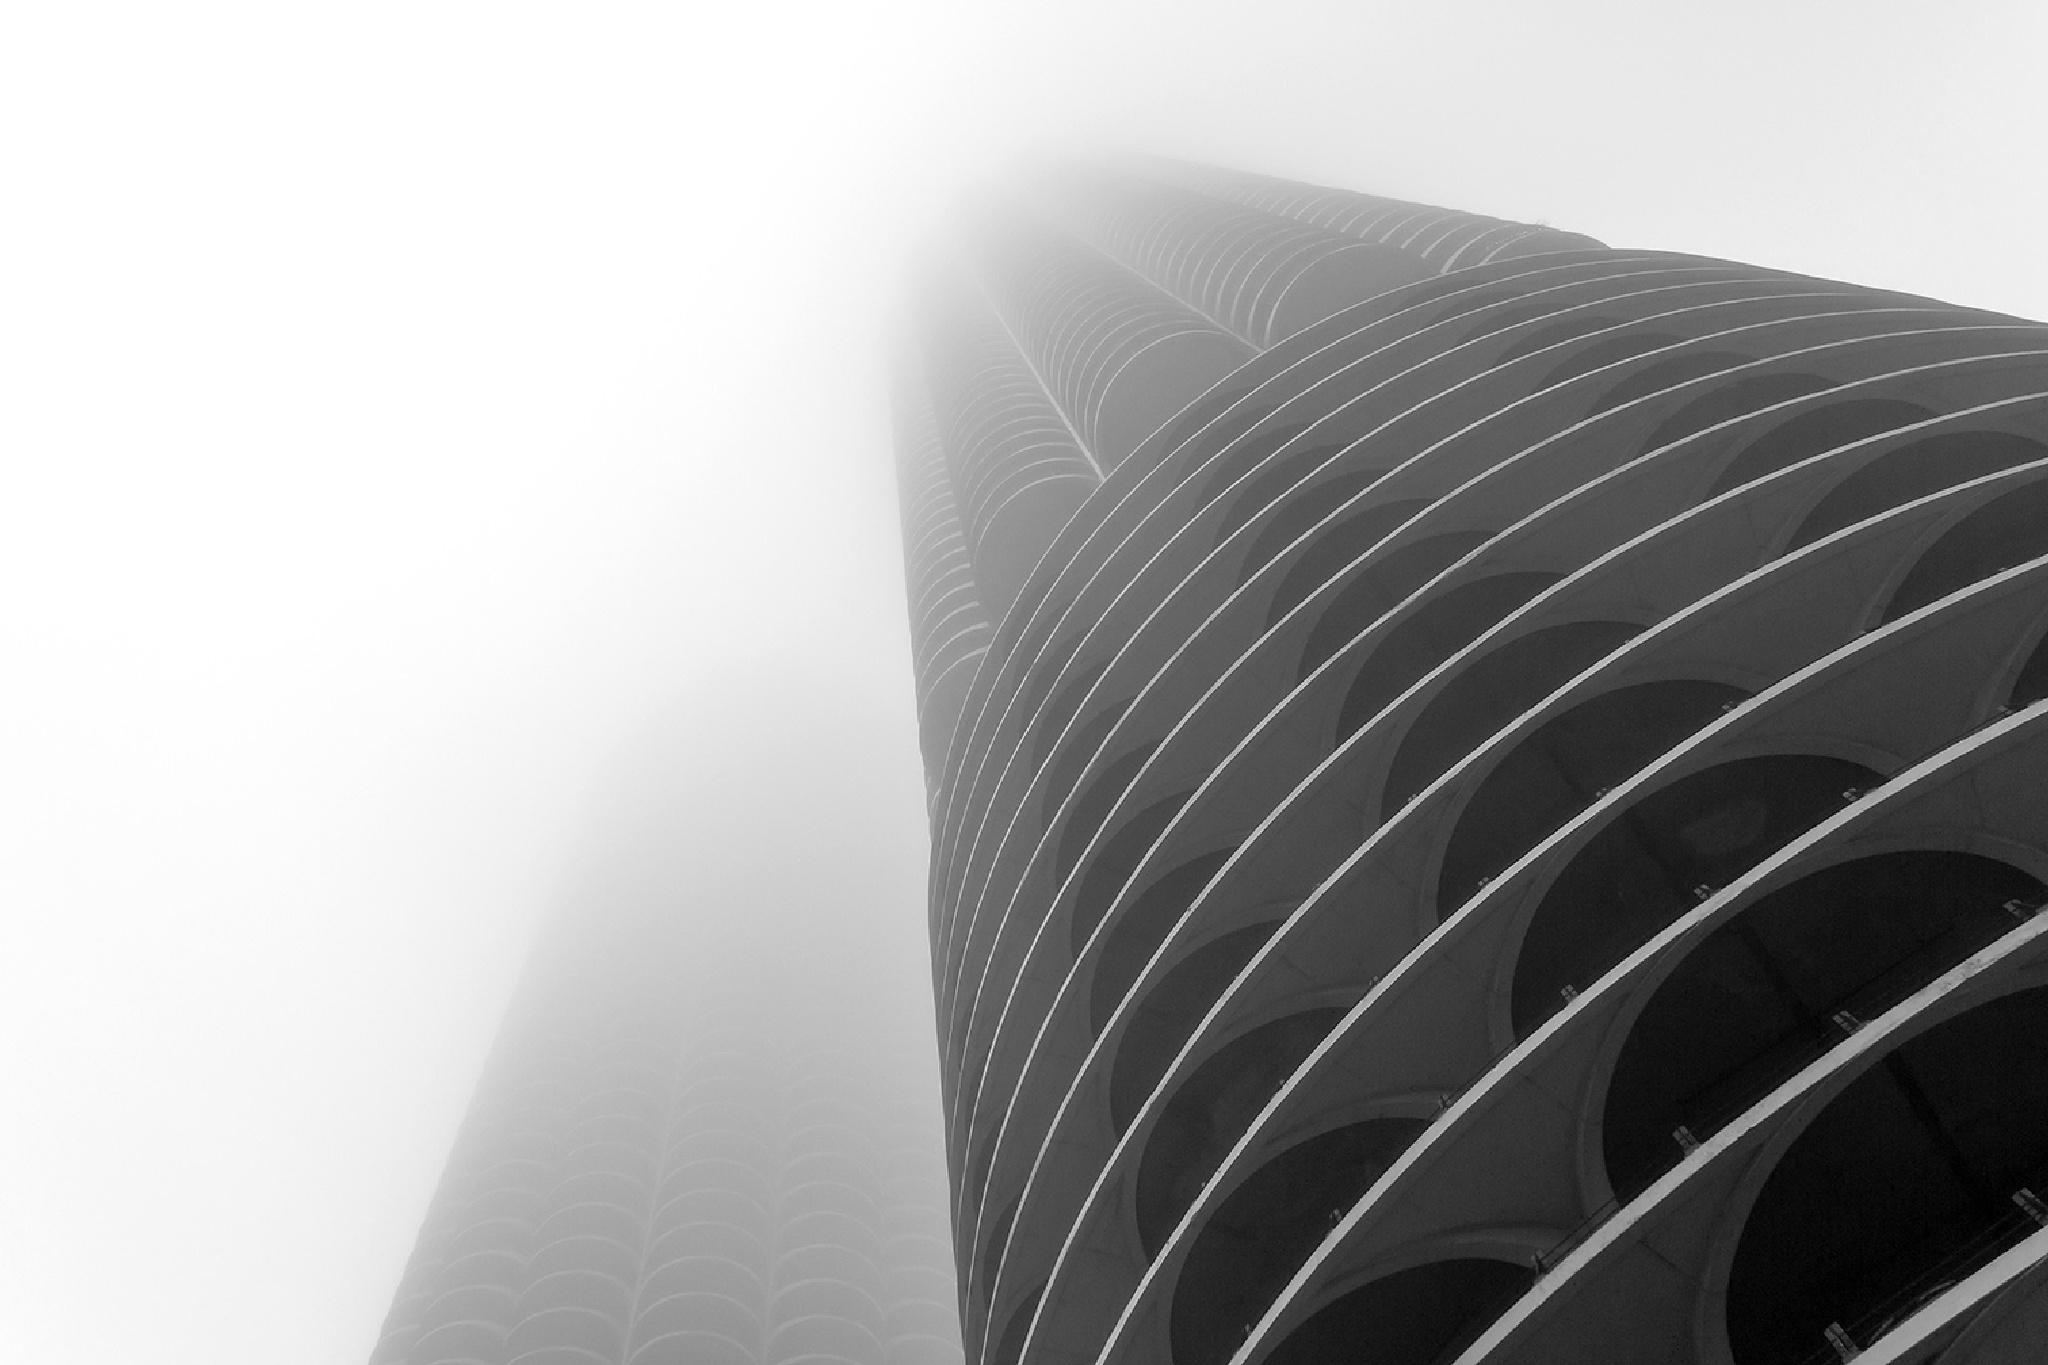 Marina Towers by rickferris